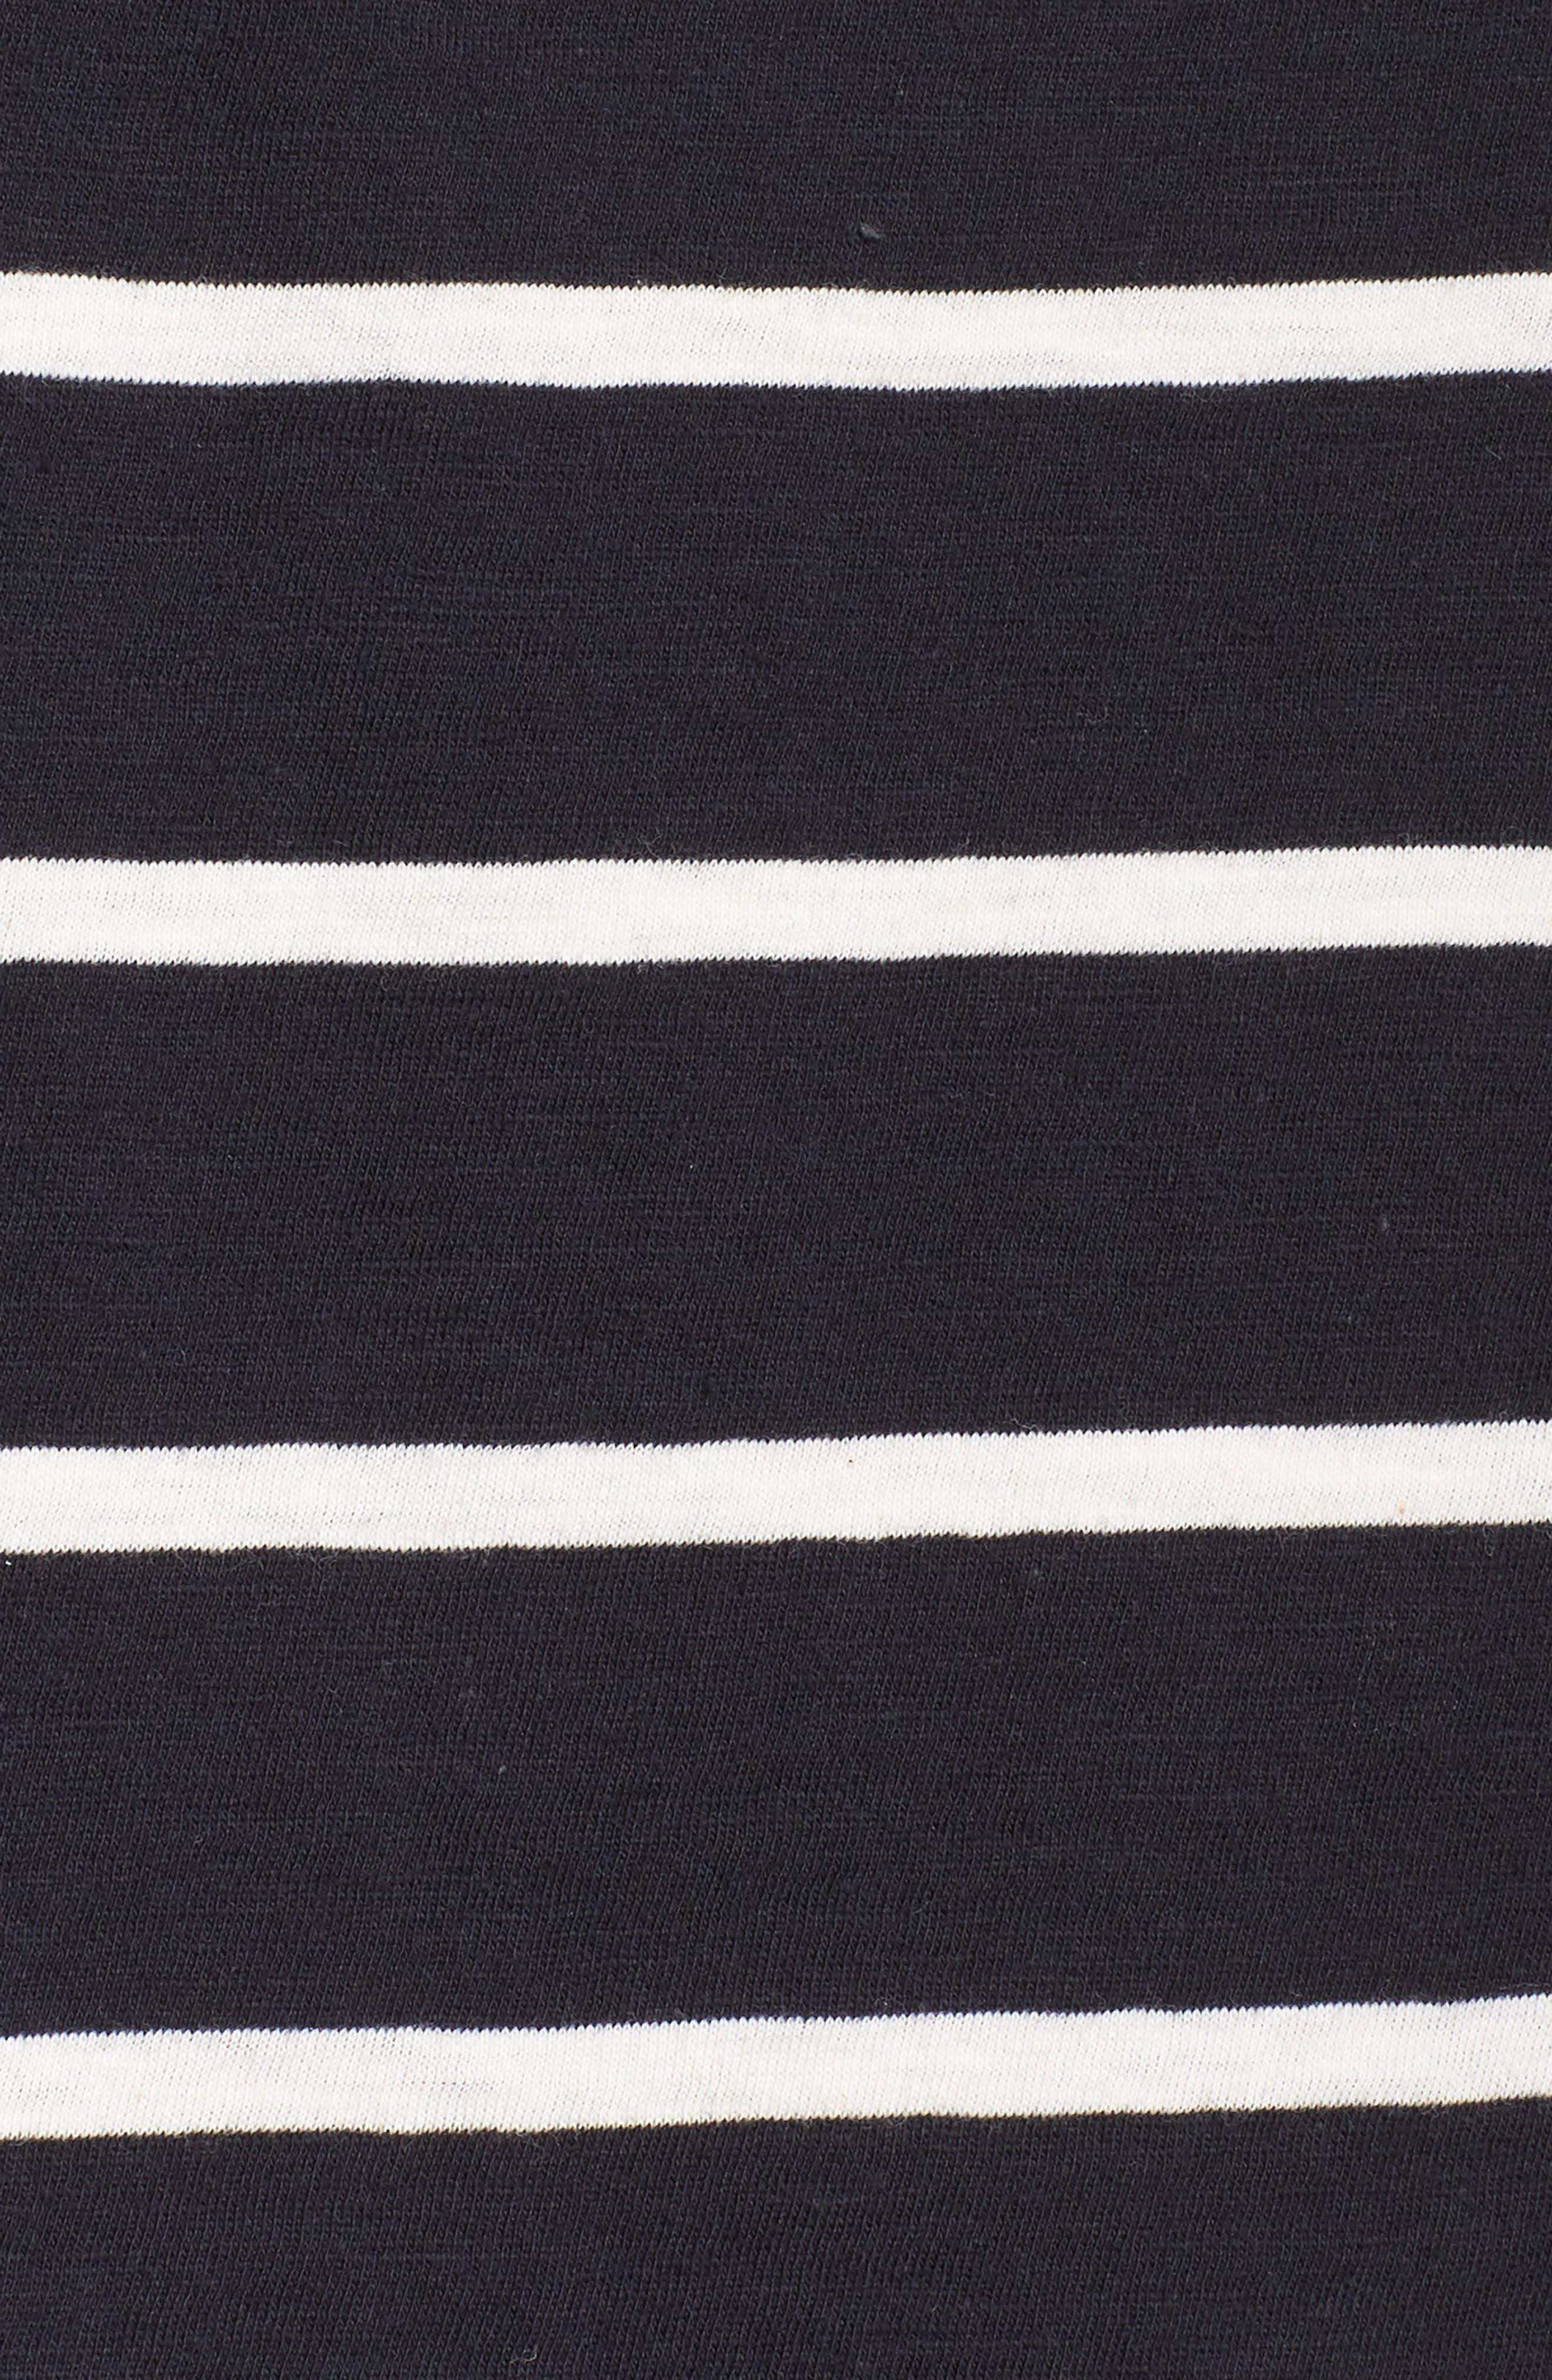 Stripe Organic Cotton Top,                             Alternate thumbnail 6, color,                             018